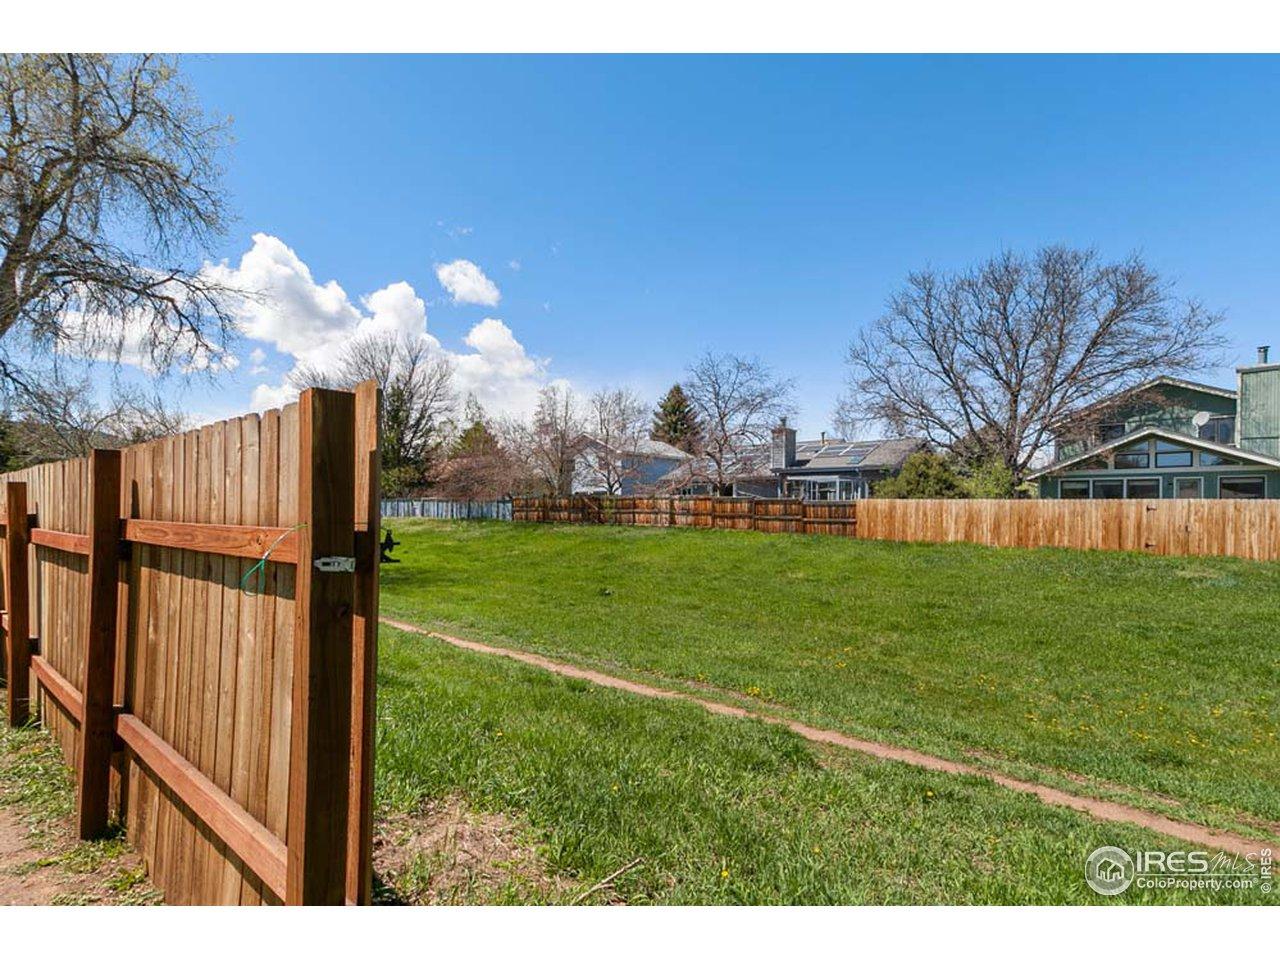 Gate adjoining green space